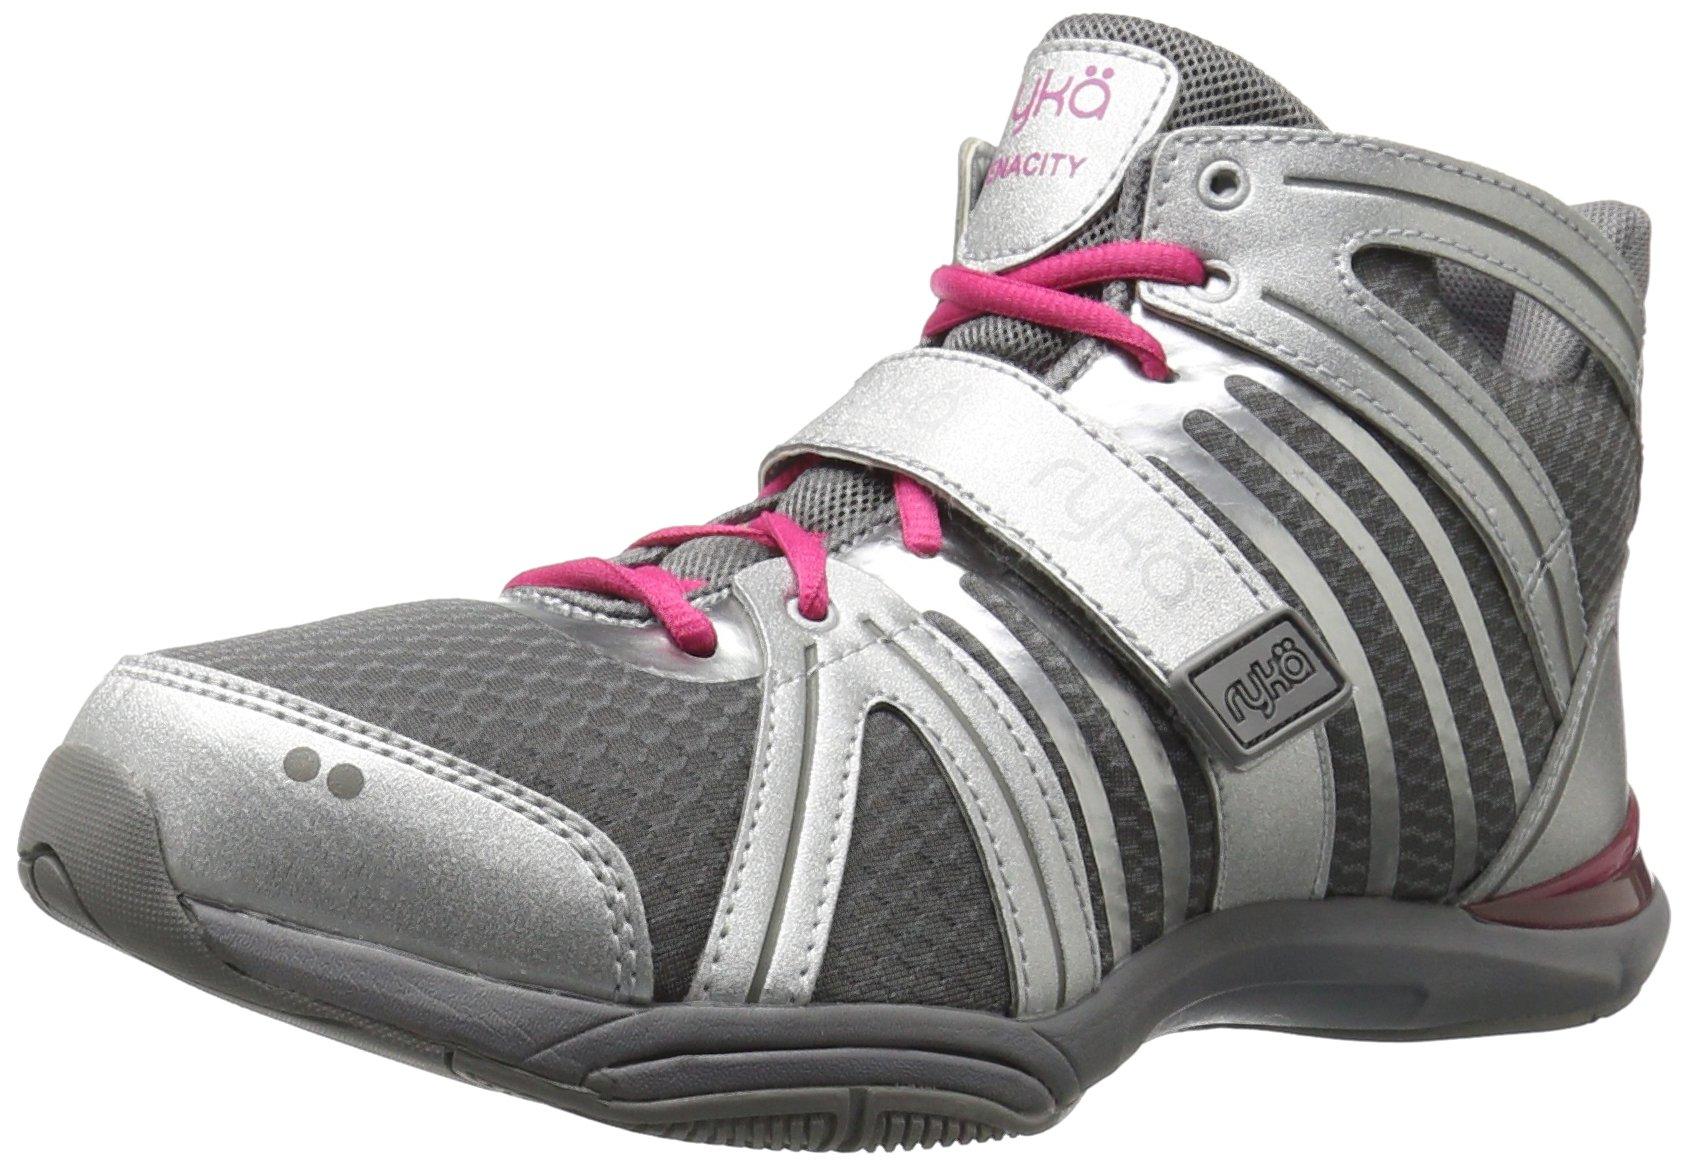 Ryka Women's Tenacity Cross-Trainer Shoe, Silver, 9.5 M US